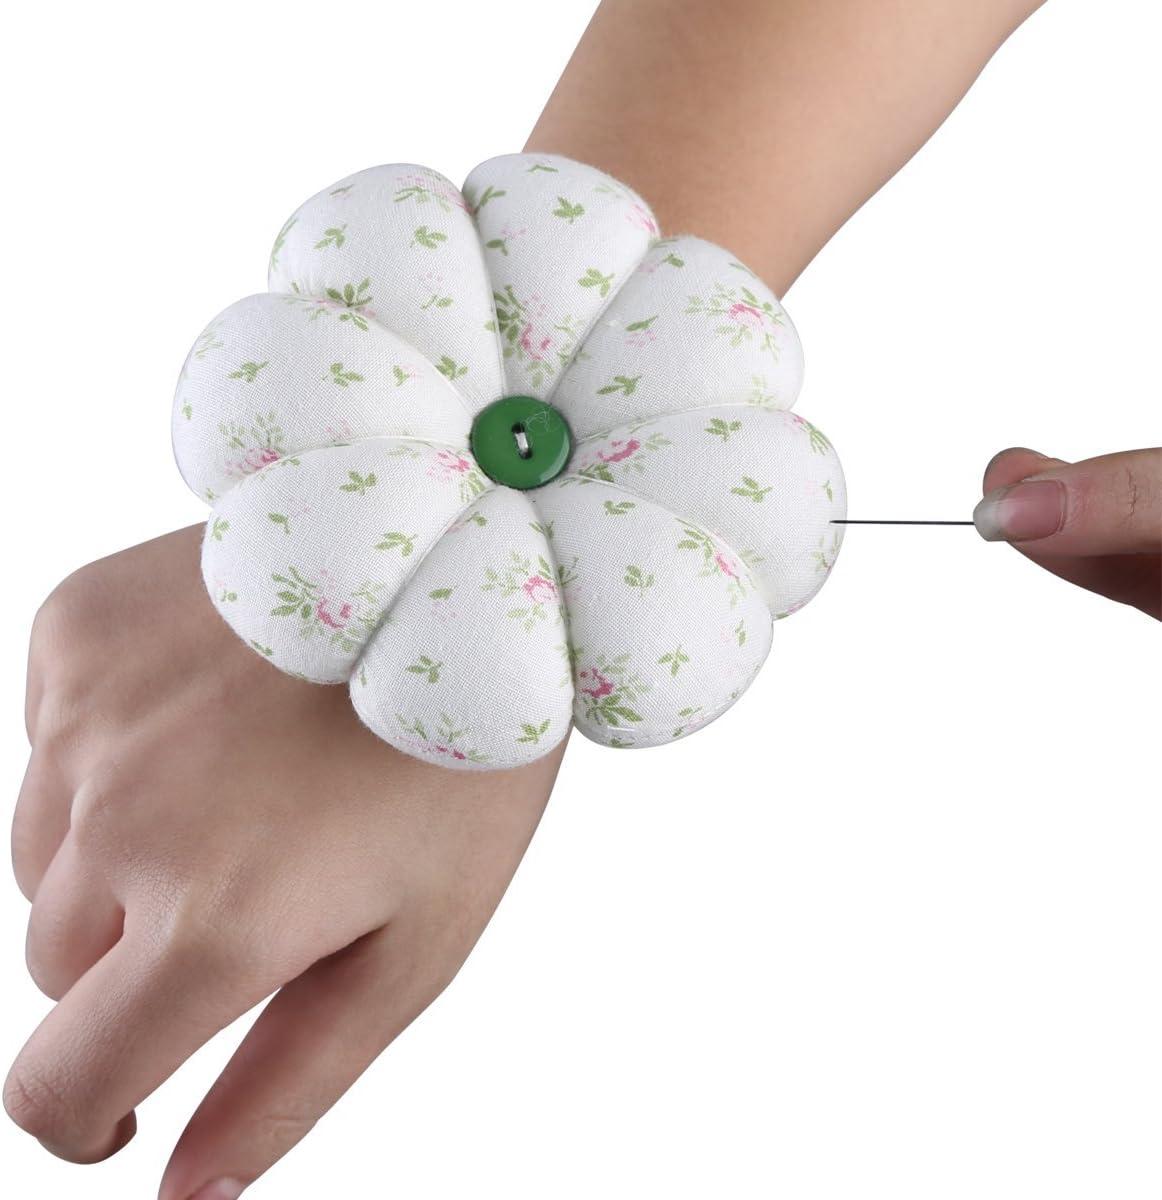 Polka Dot Red by Neoviva Neoviva Fabric Coated Wrist Wearable Pumpkin Pin Cushion for Hand Craft